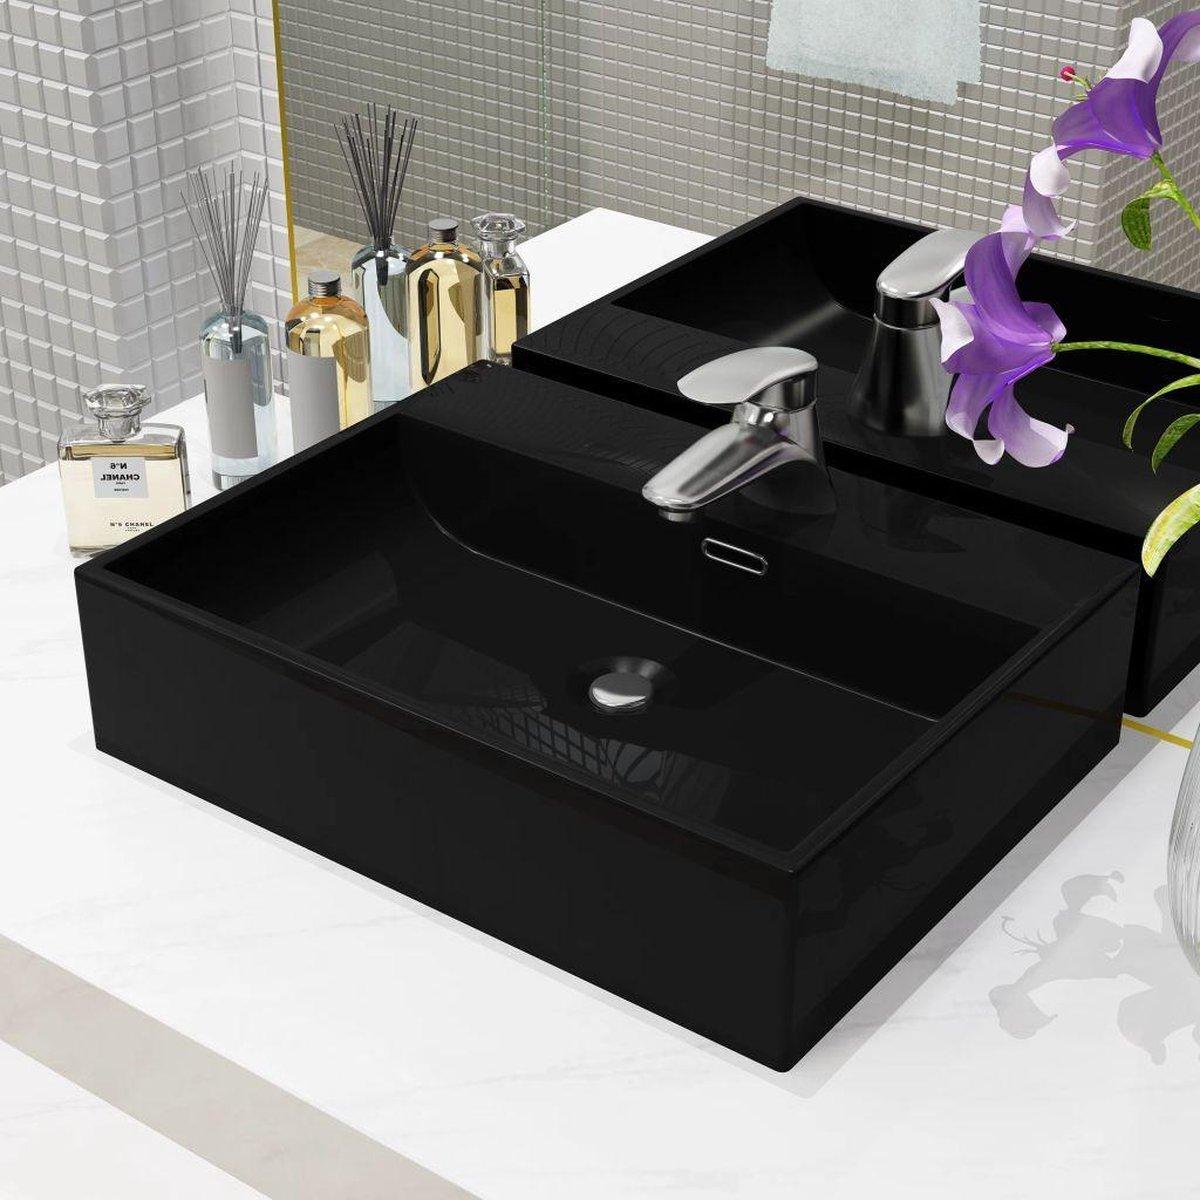 vidaXL Wastafel met kraangat 51.5x38.5x15 cm keramiek zwart